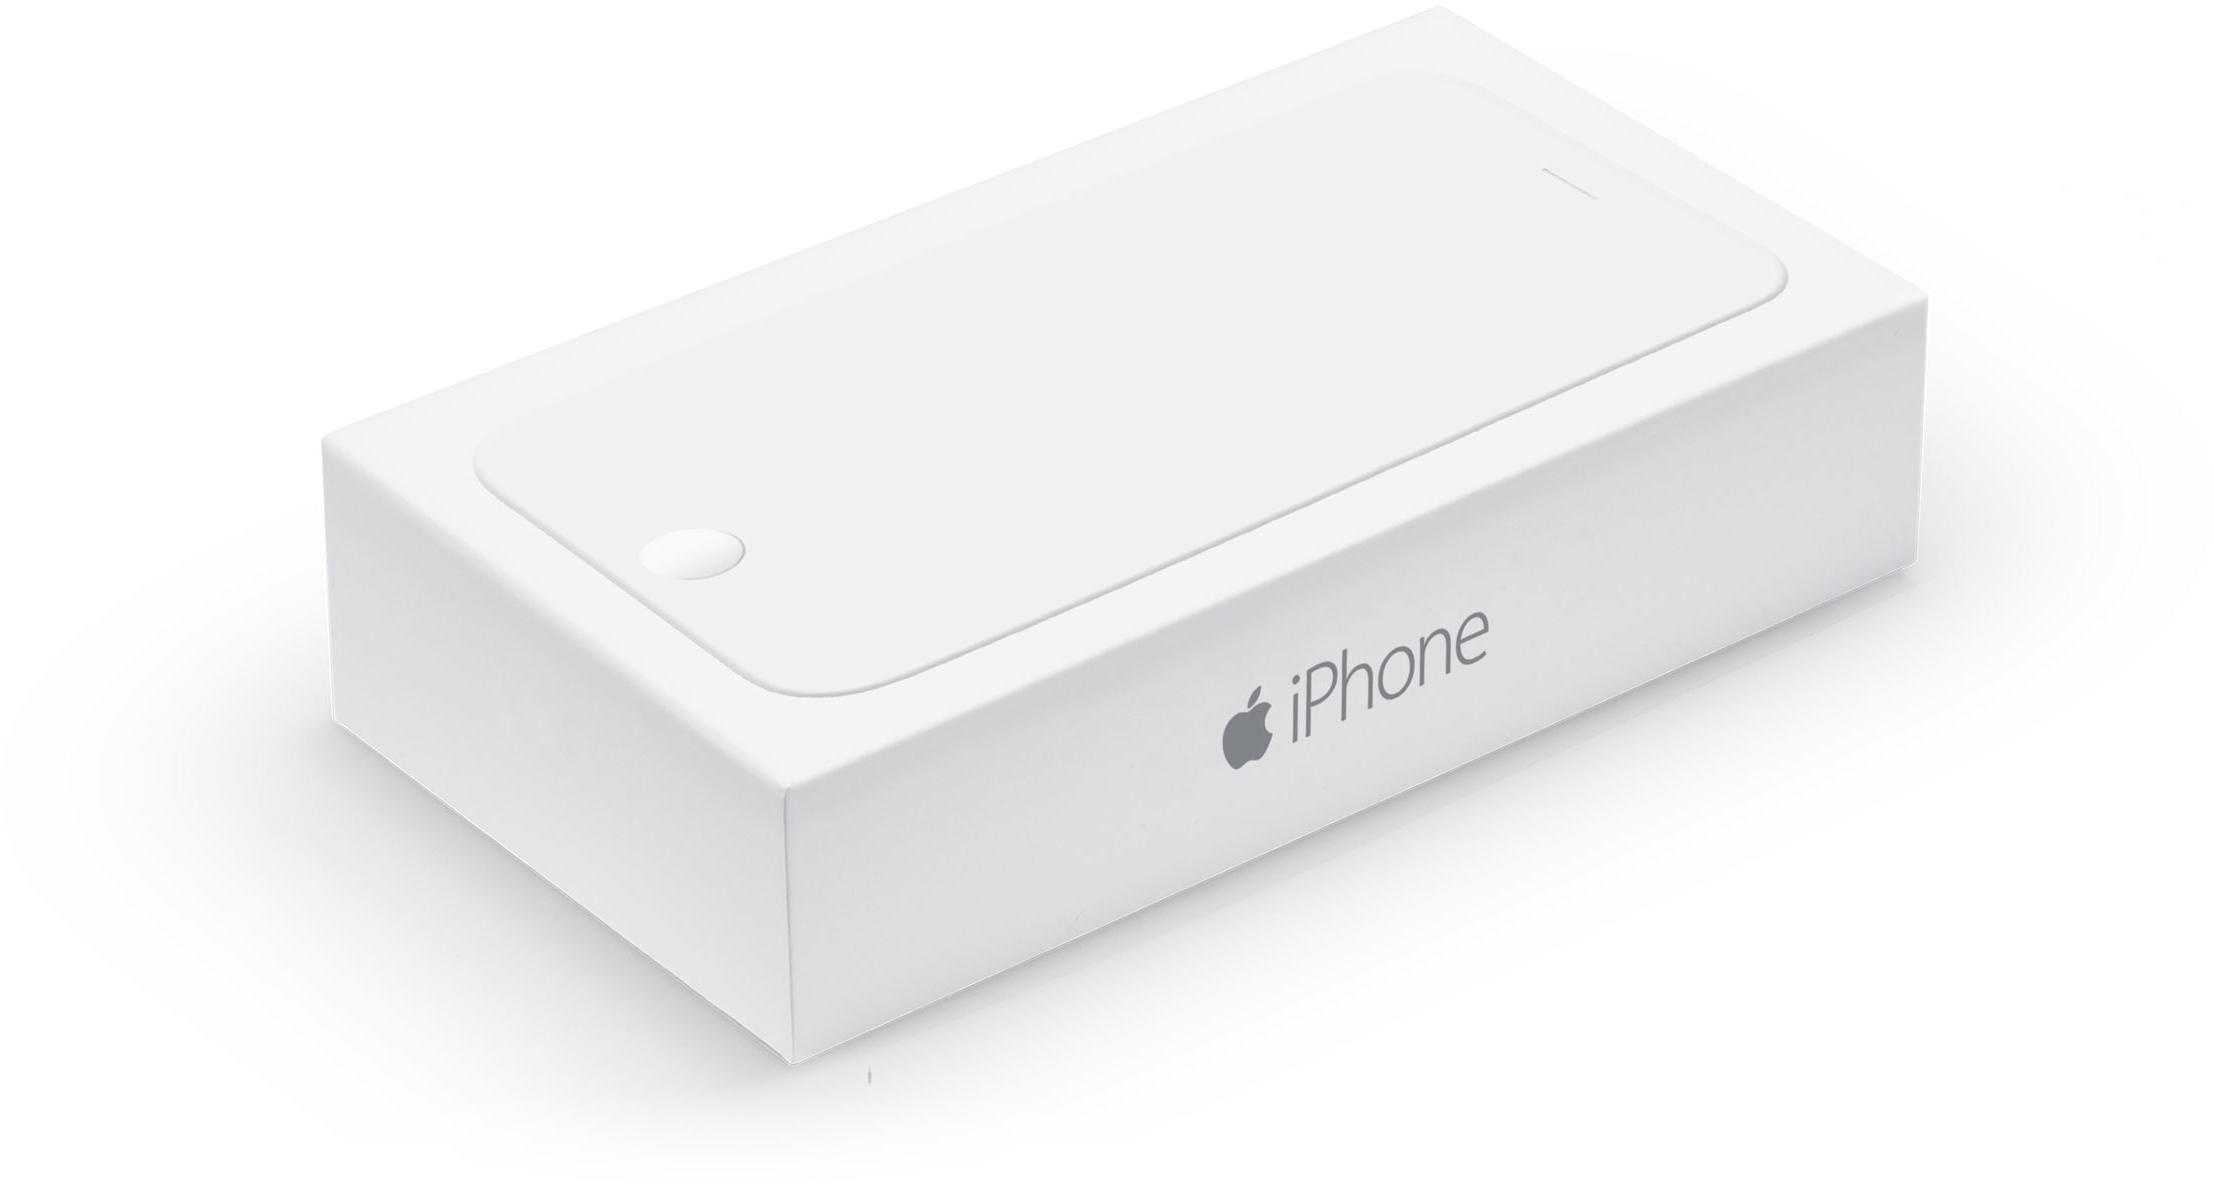 Caixa do iPhone 6